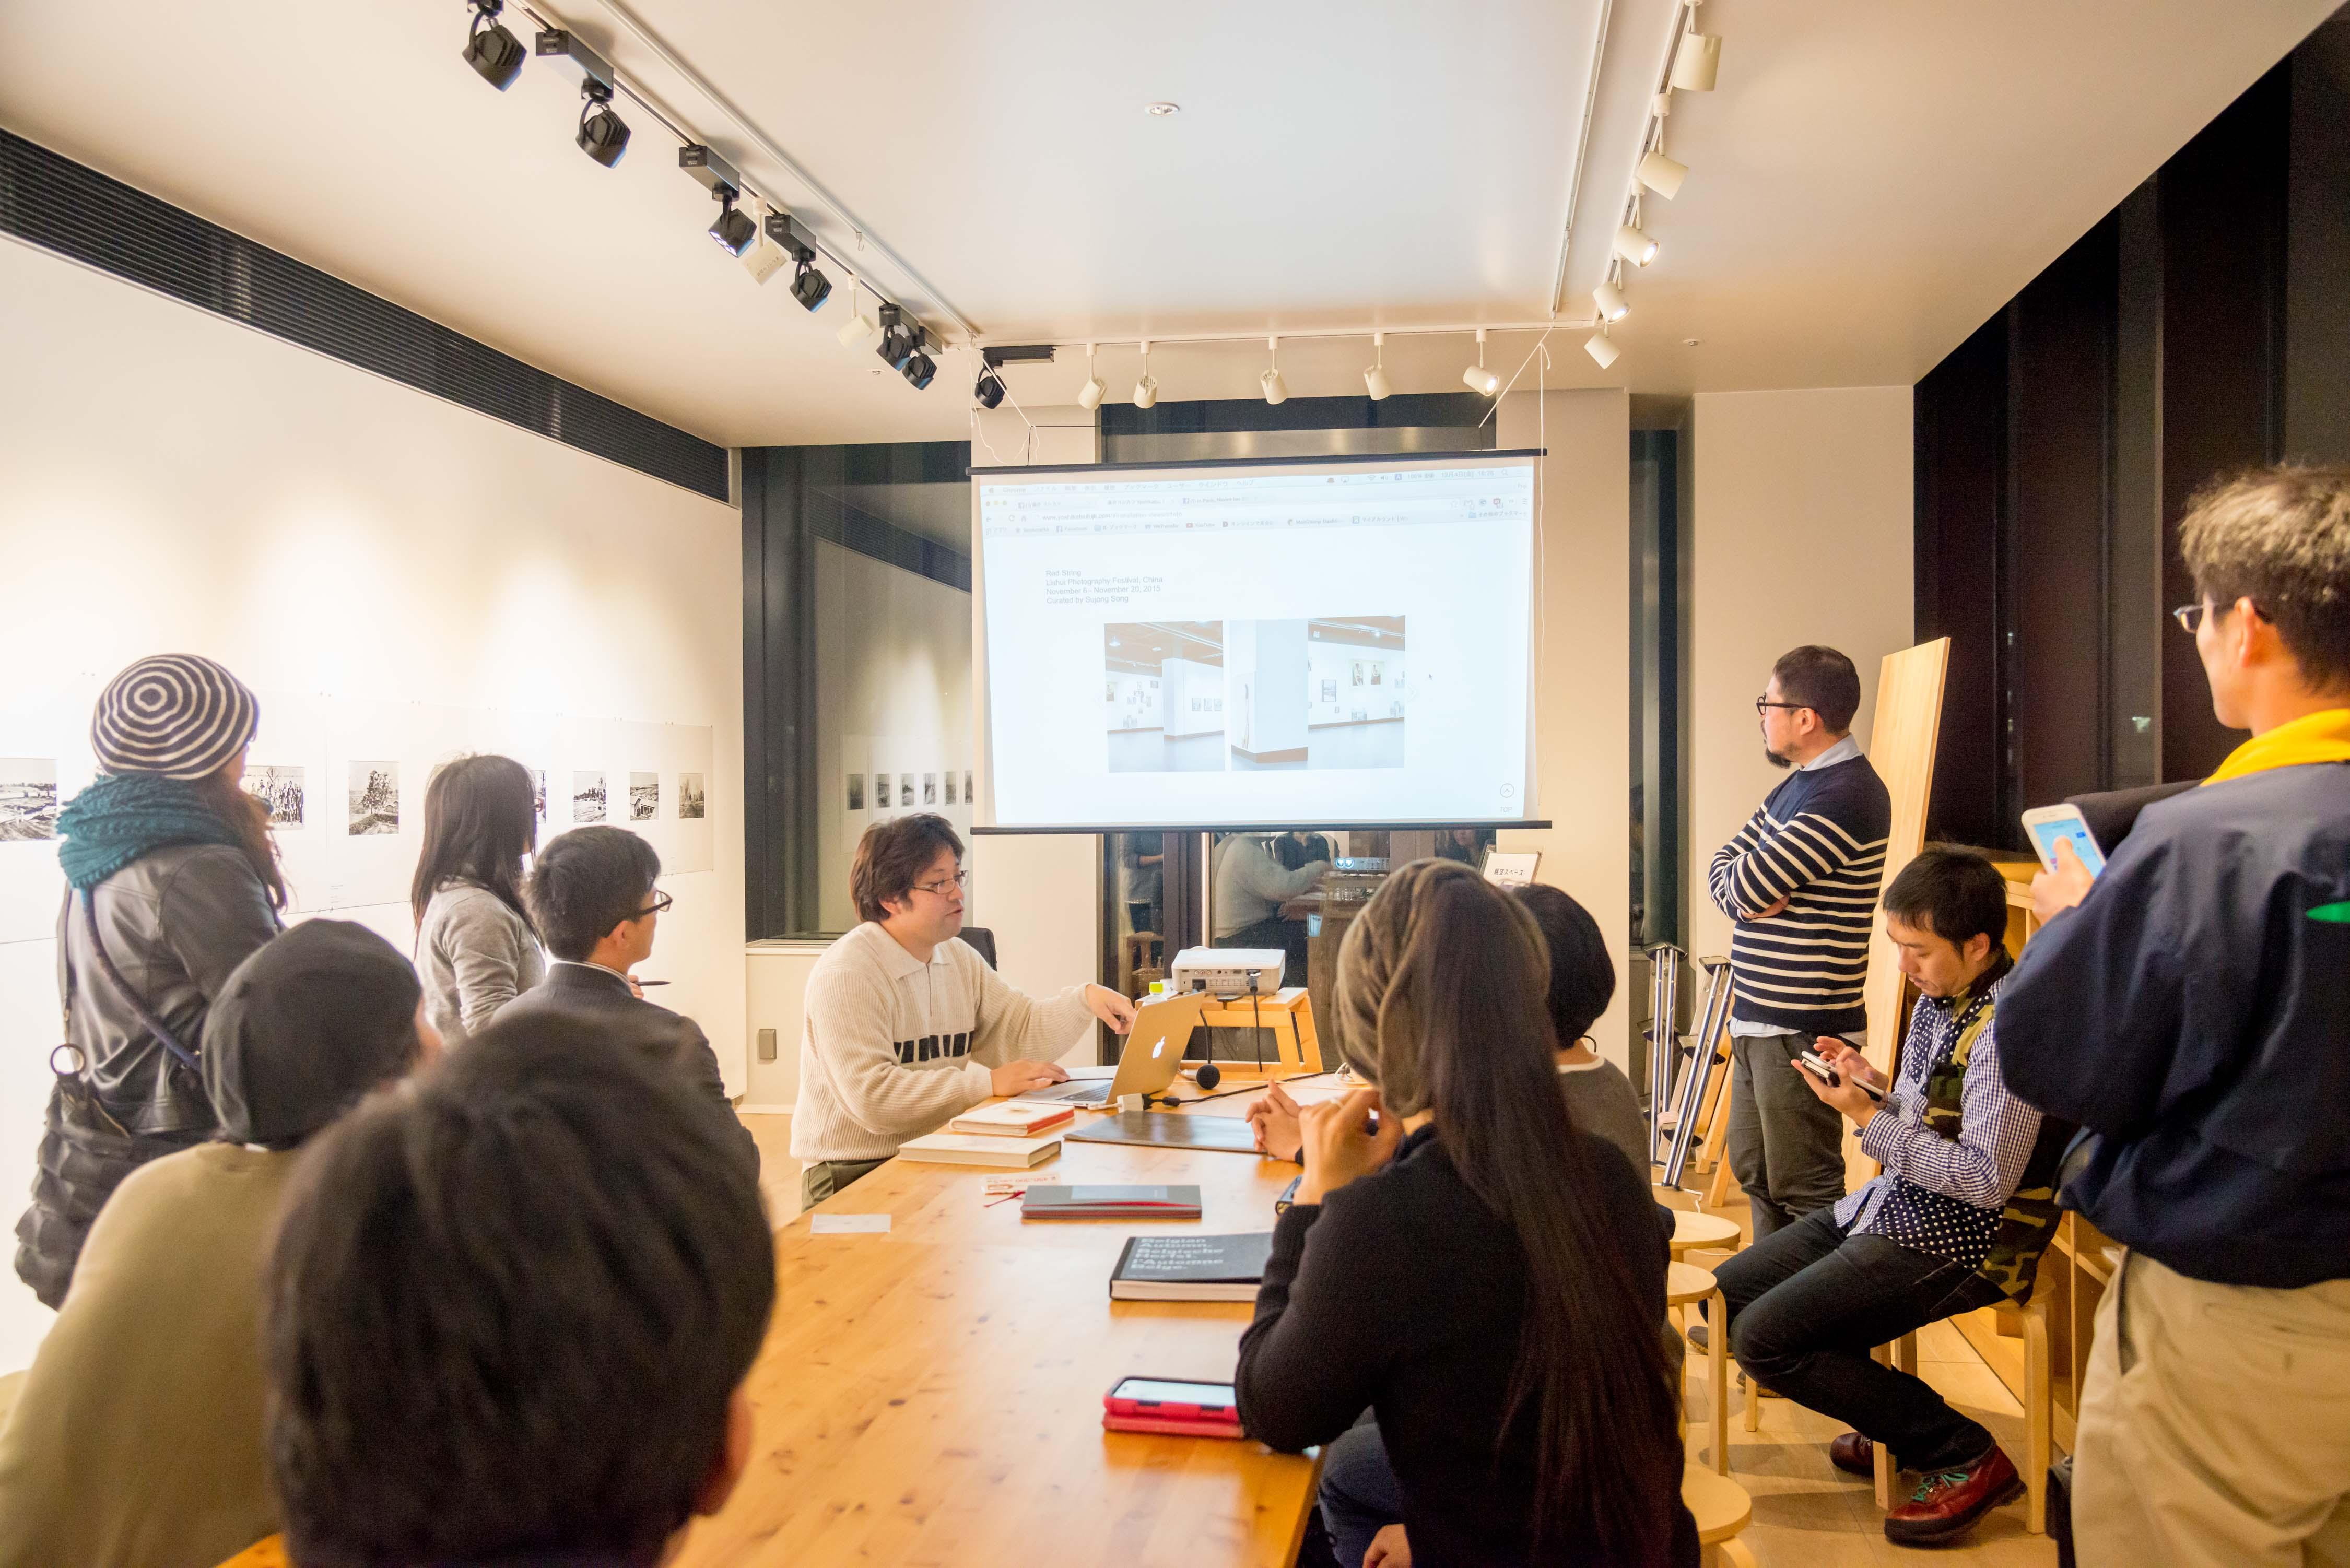 fujii yoshikatsu artist talk